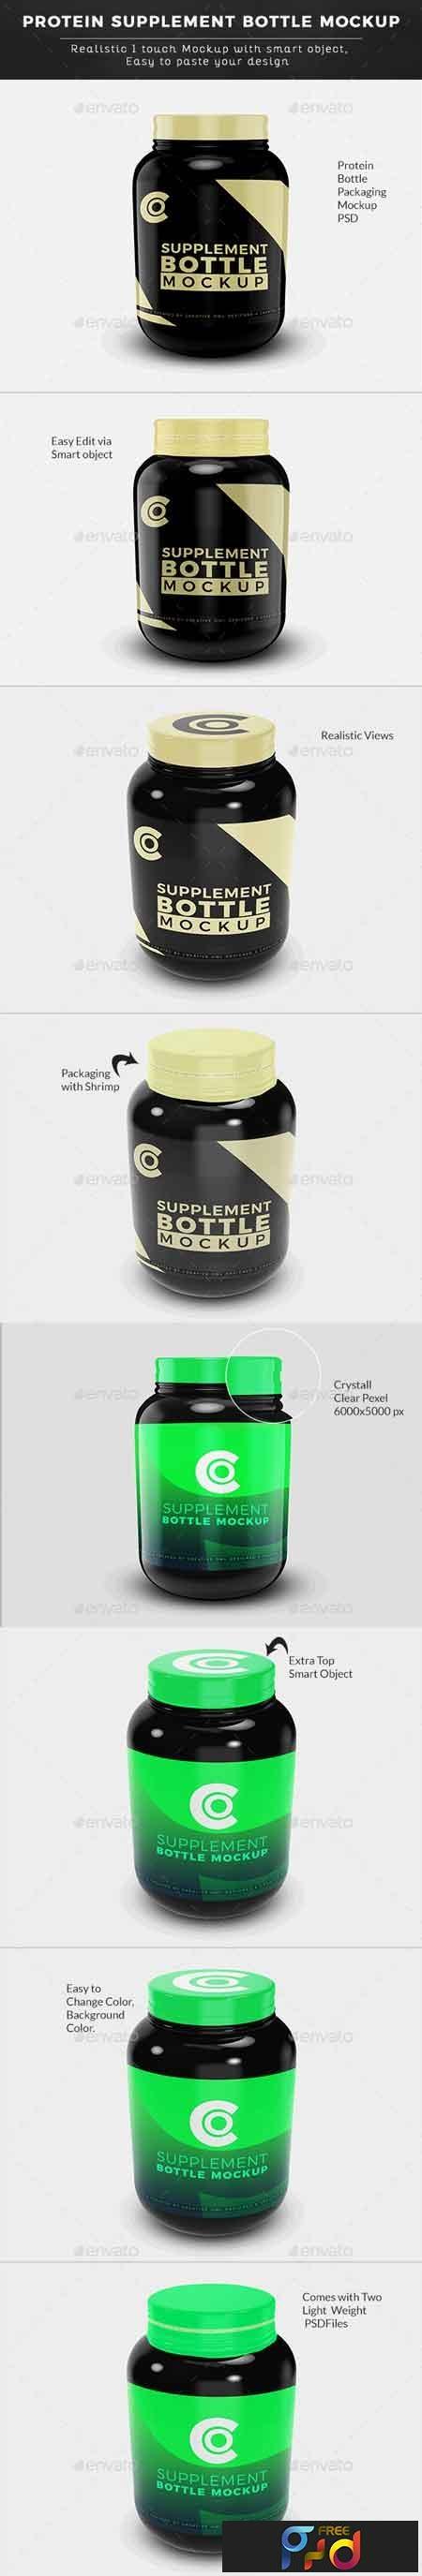 Protein Supplement Bottle Mockup 22710606 1